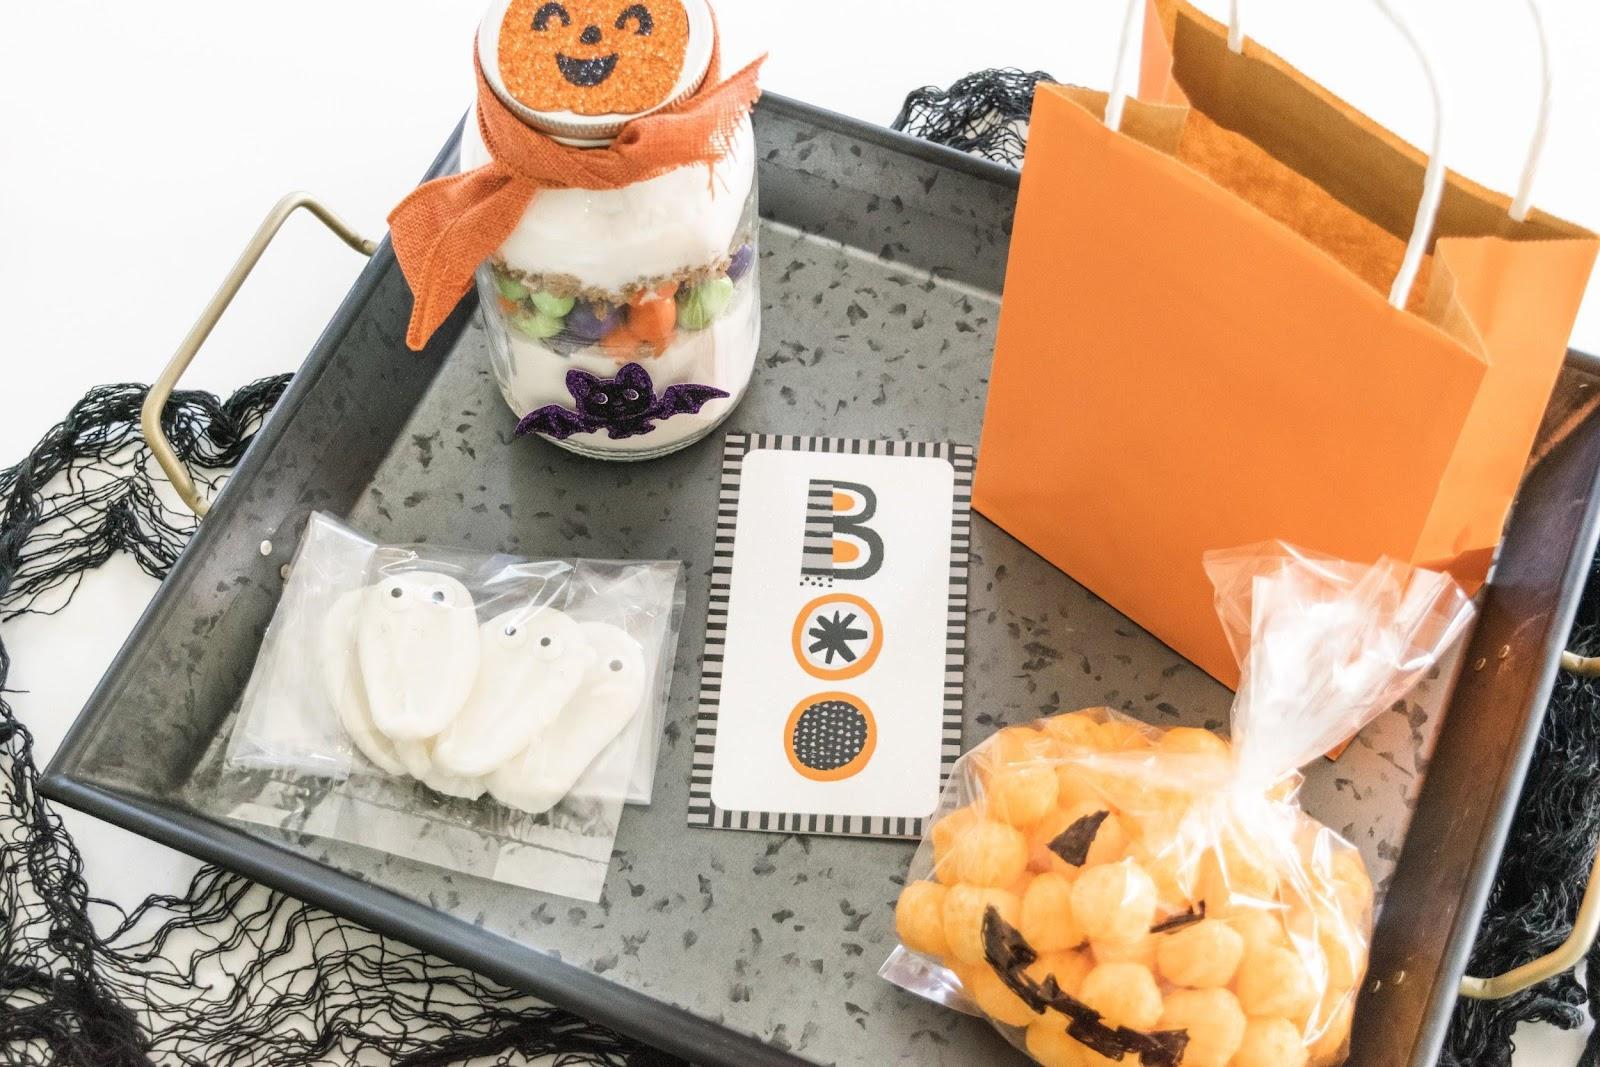 Boo Kit & Mason Jar M&M'S Ghoul Cookies